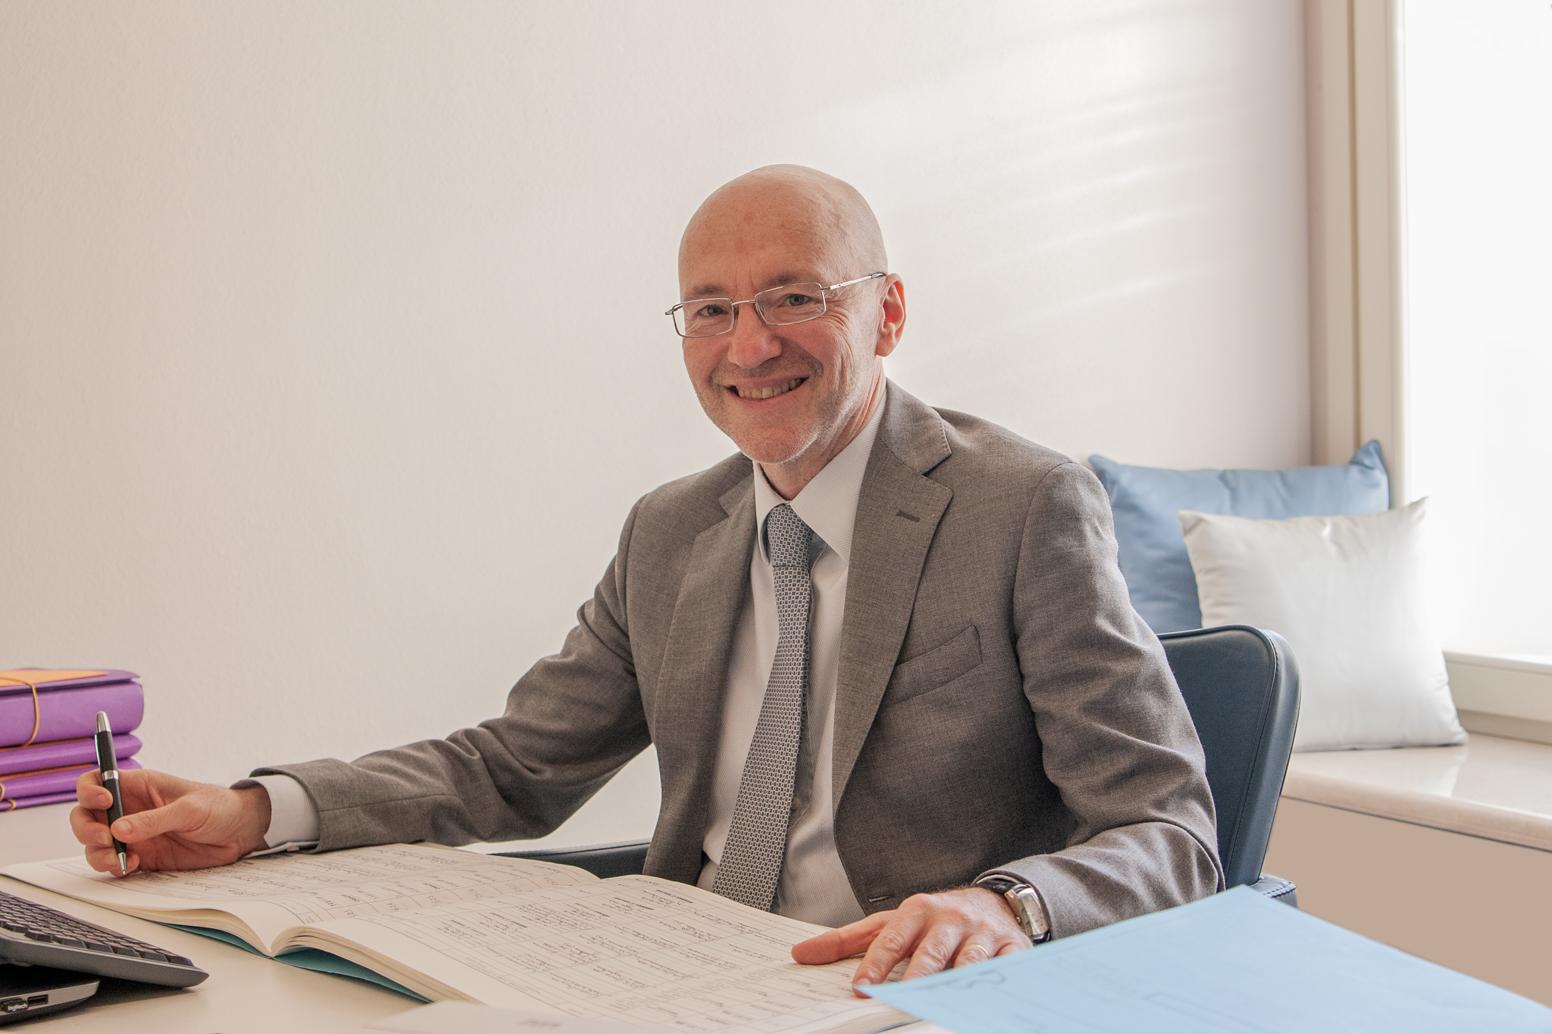 Dott. Massimiliano Giuseppe Strina